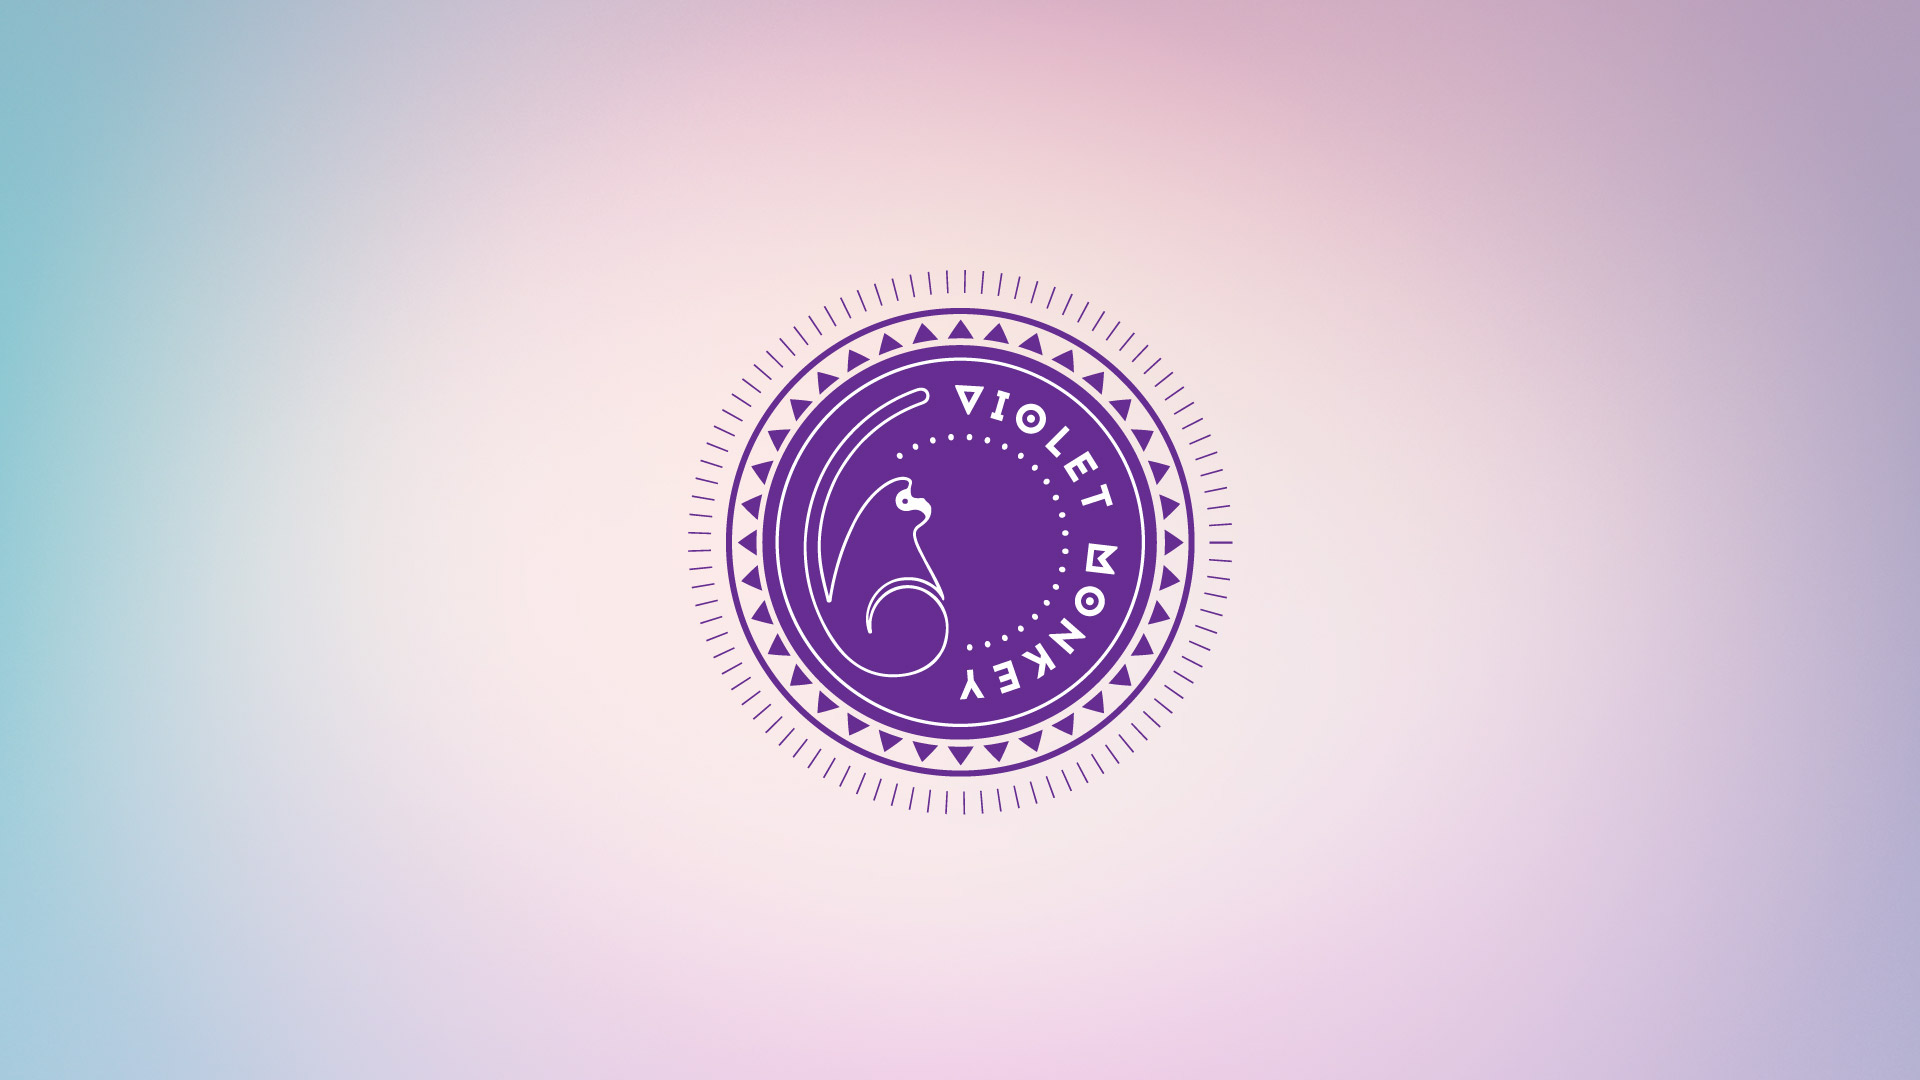 elisa-antonacci-violet-monkey-logo